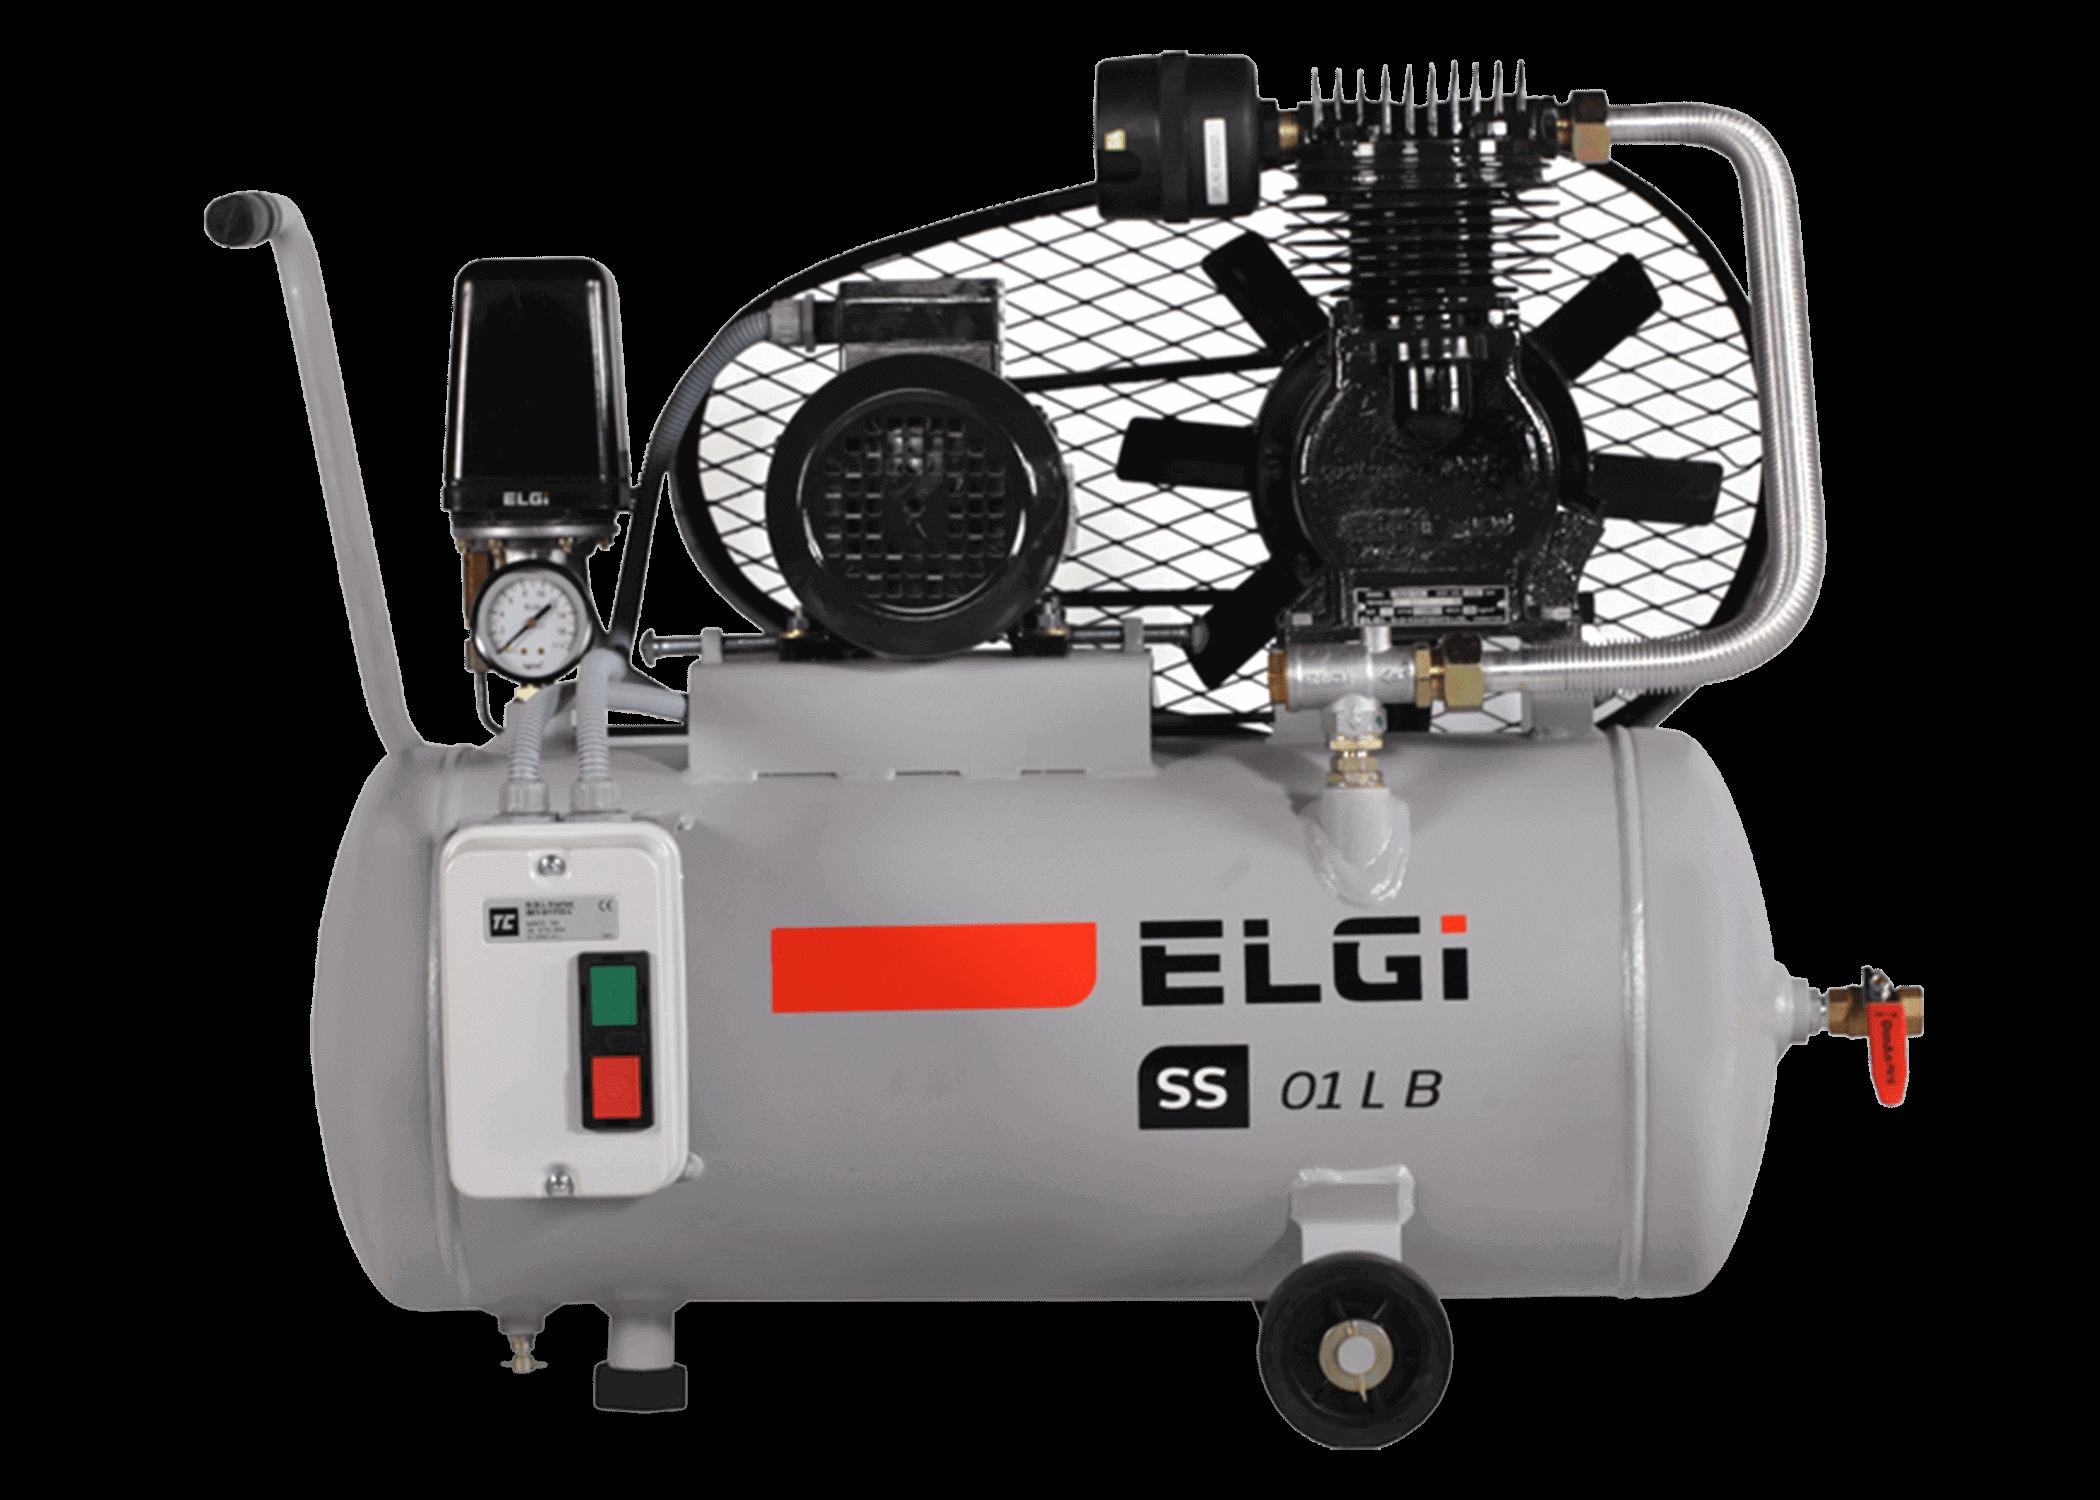 Air Compressor for Garage Industry